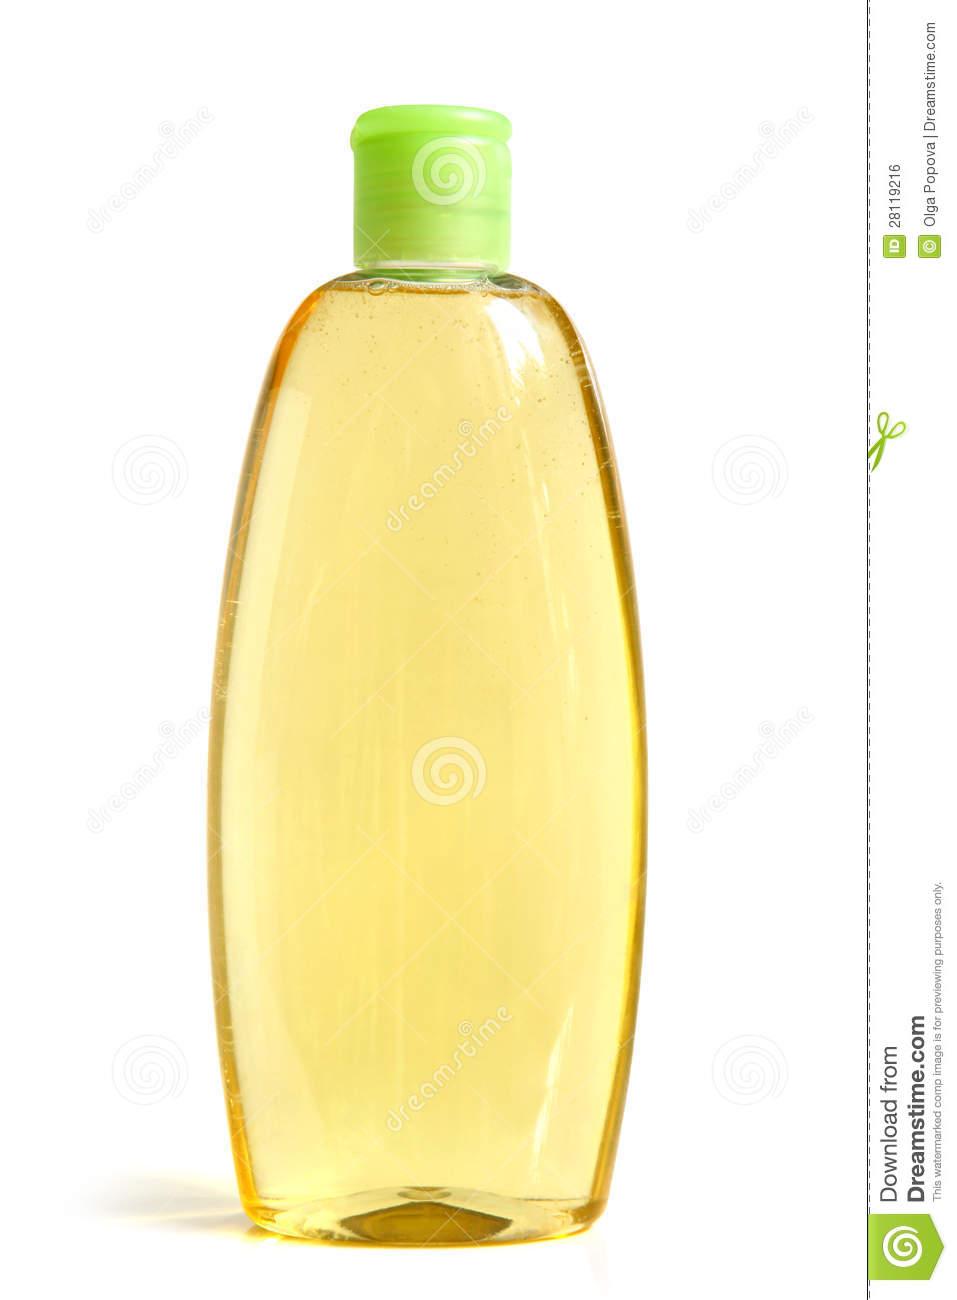 shampoo bottle 28119216 jpg clipart panda free clipart images shampoo bottle 28119216 jpg clipart panda free clipart images